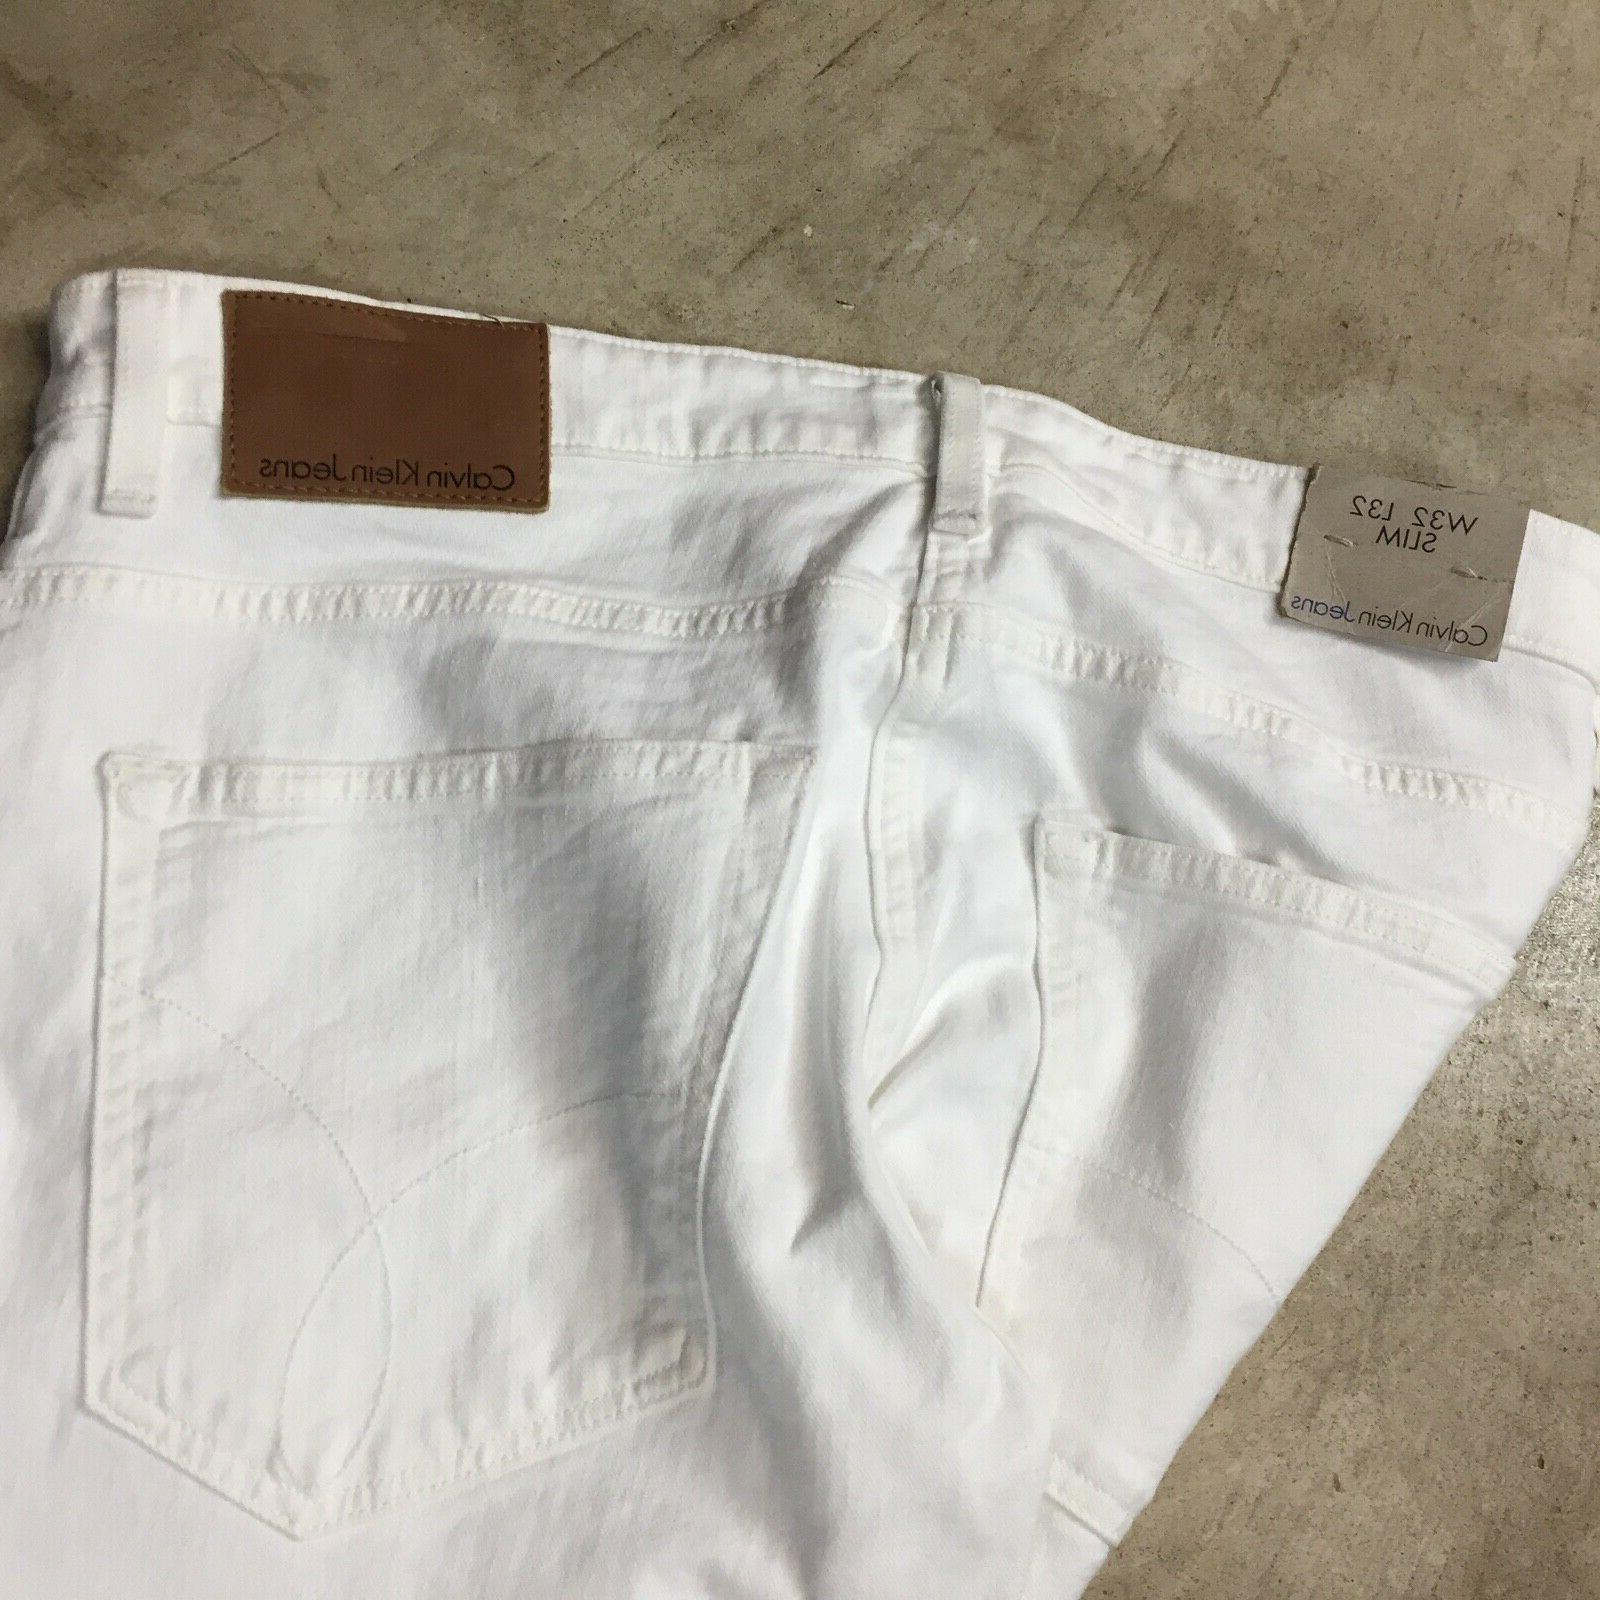 NEW jeans slim white distressed